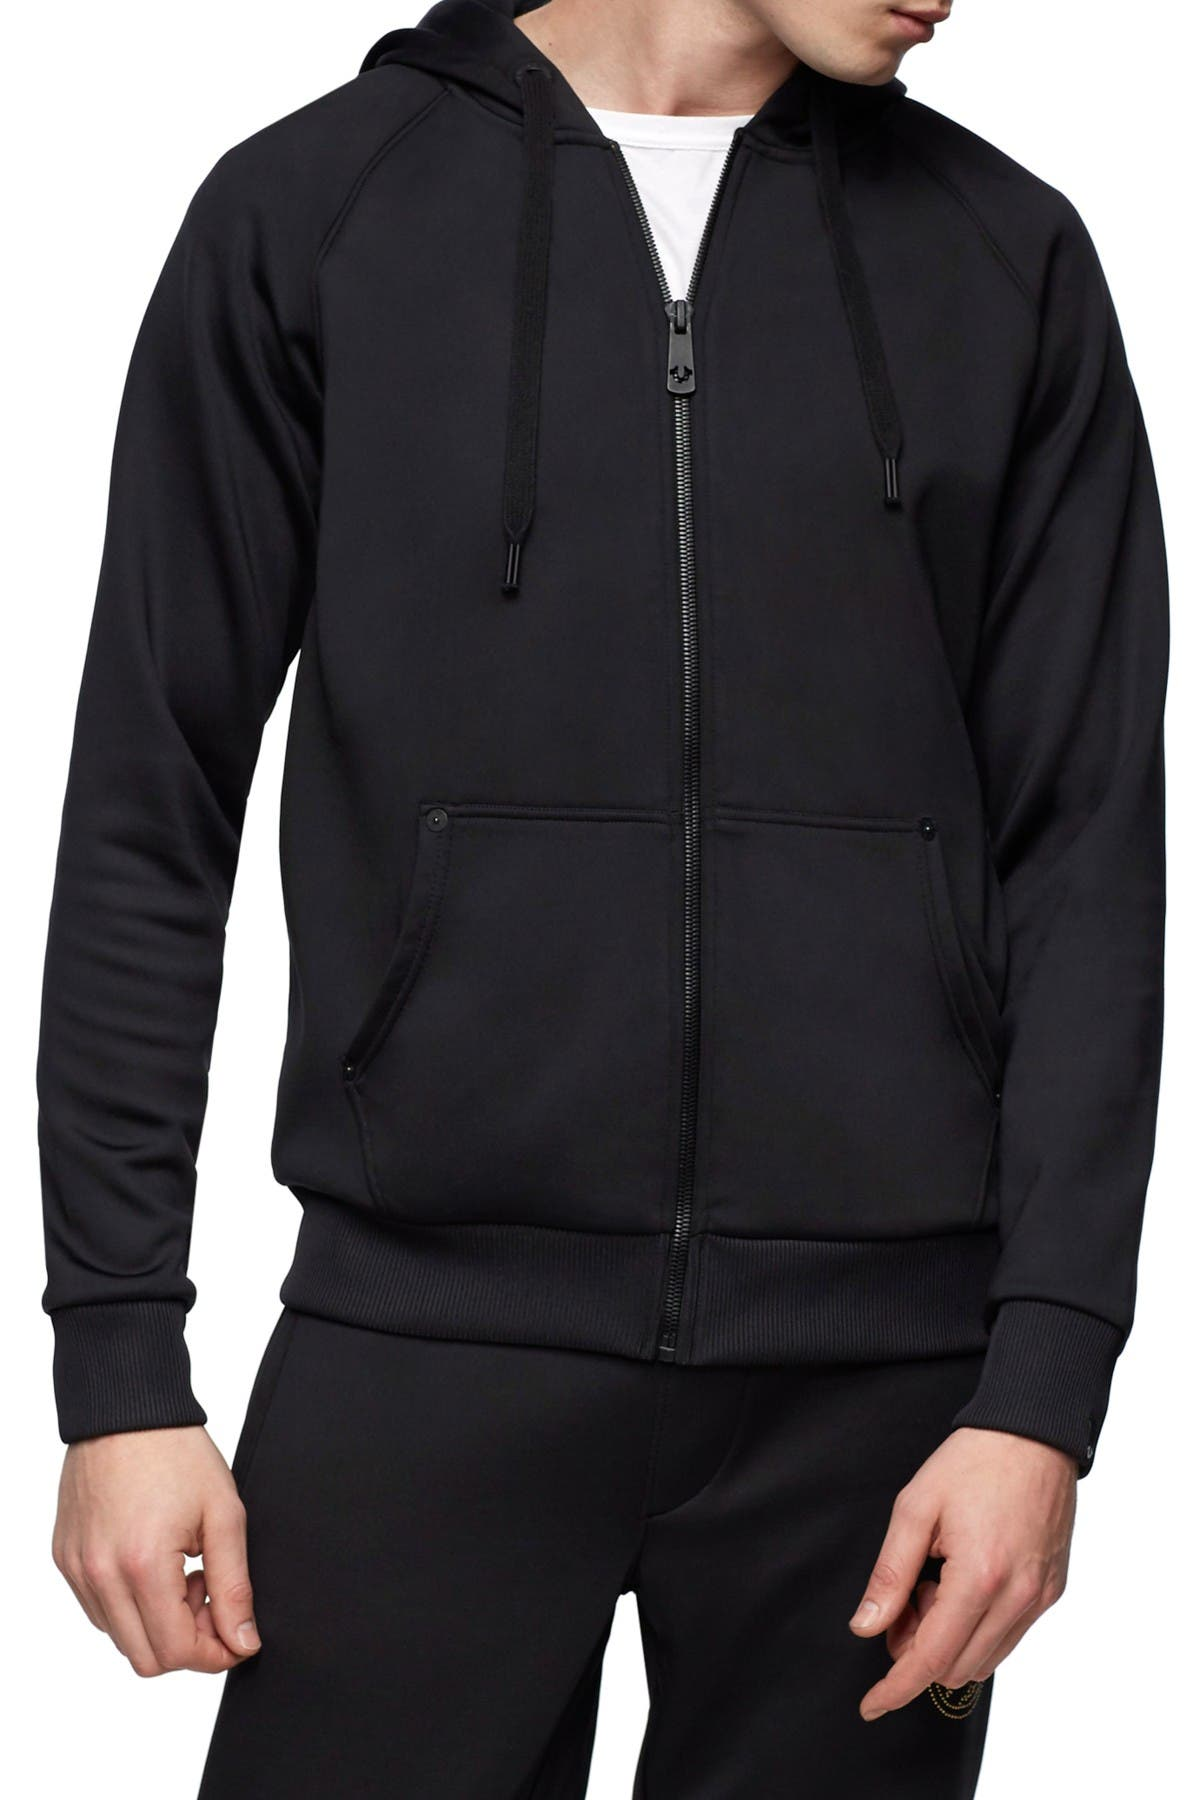 Image of True Religion Studded Graphic Zip Jacket